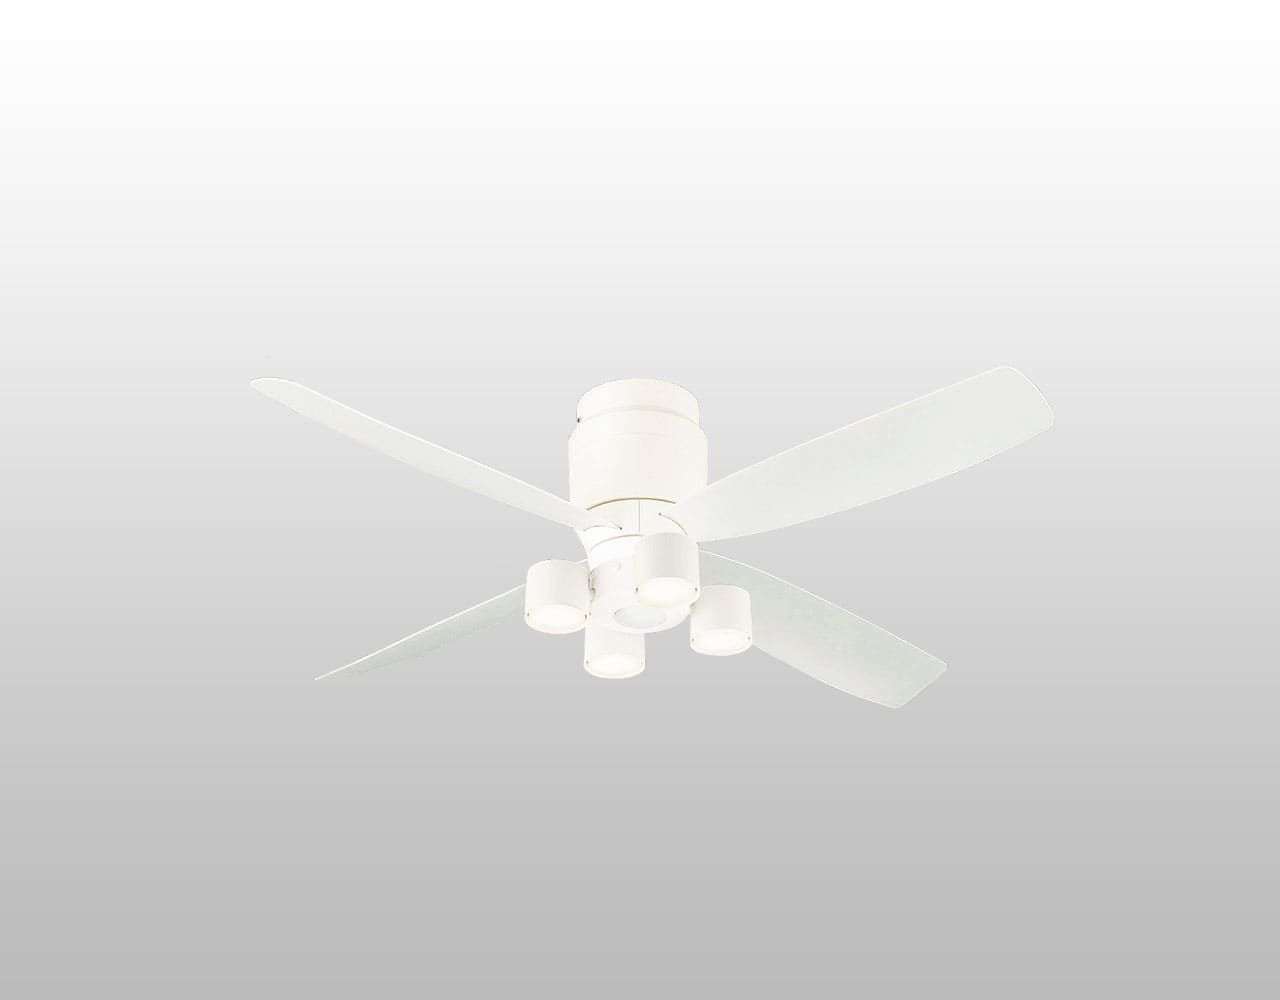 SP7070 + SPL5427(集光) + LLD3020MLCE1 / LLD3020MVCE1 / LLD3020MNCE1,クラス700[集光タイプ]Ra90[美ルック] 大風量 LED 電球色/温白色/昼白色 4灯 薄型 軽量 Panasonic(パナソニック)製シーリングファンライト